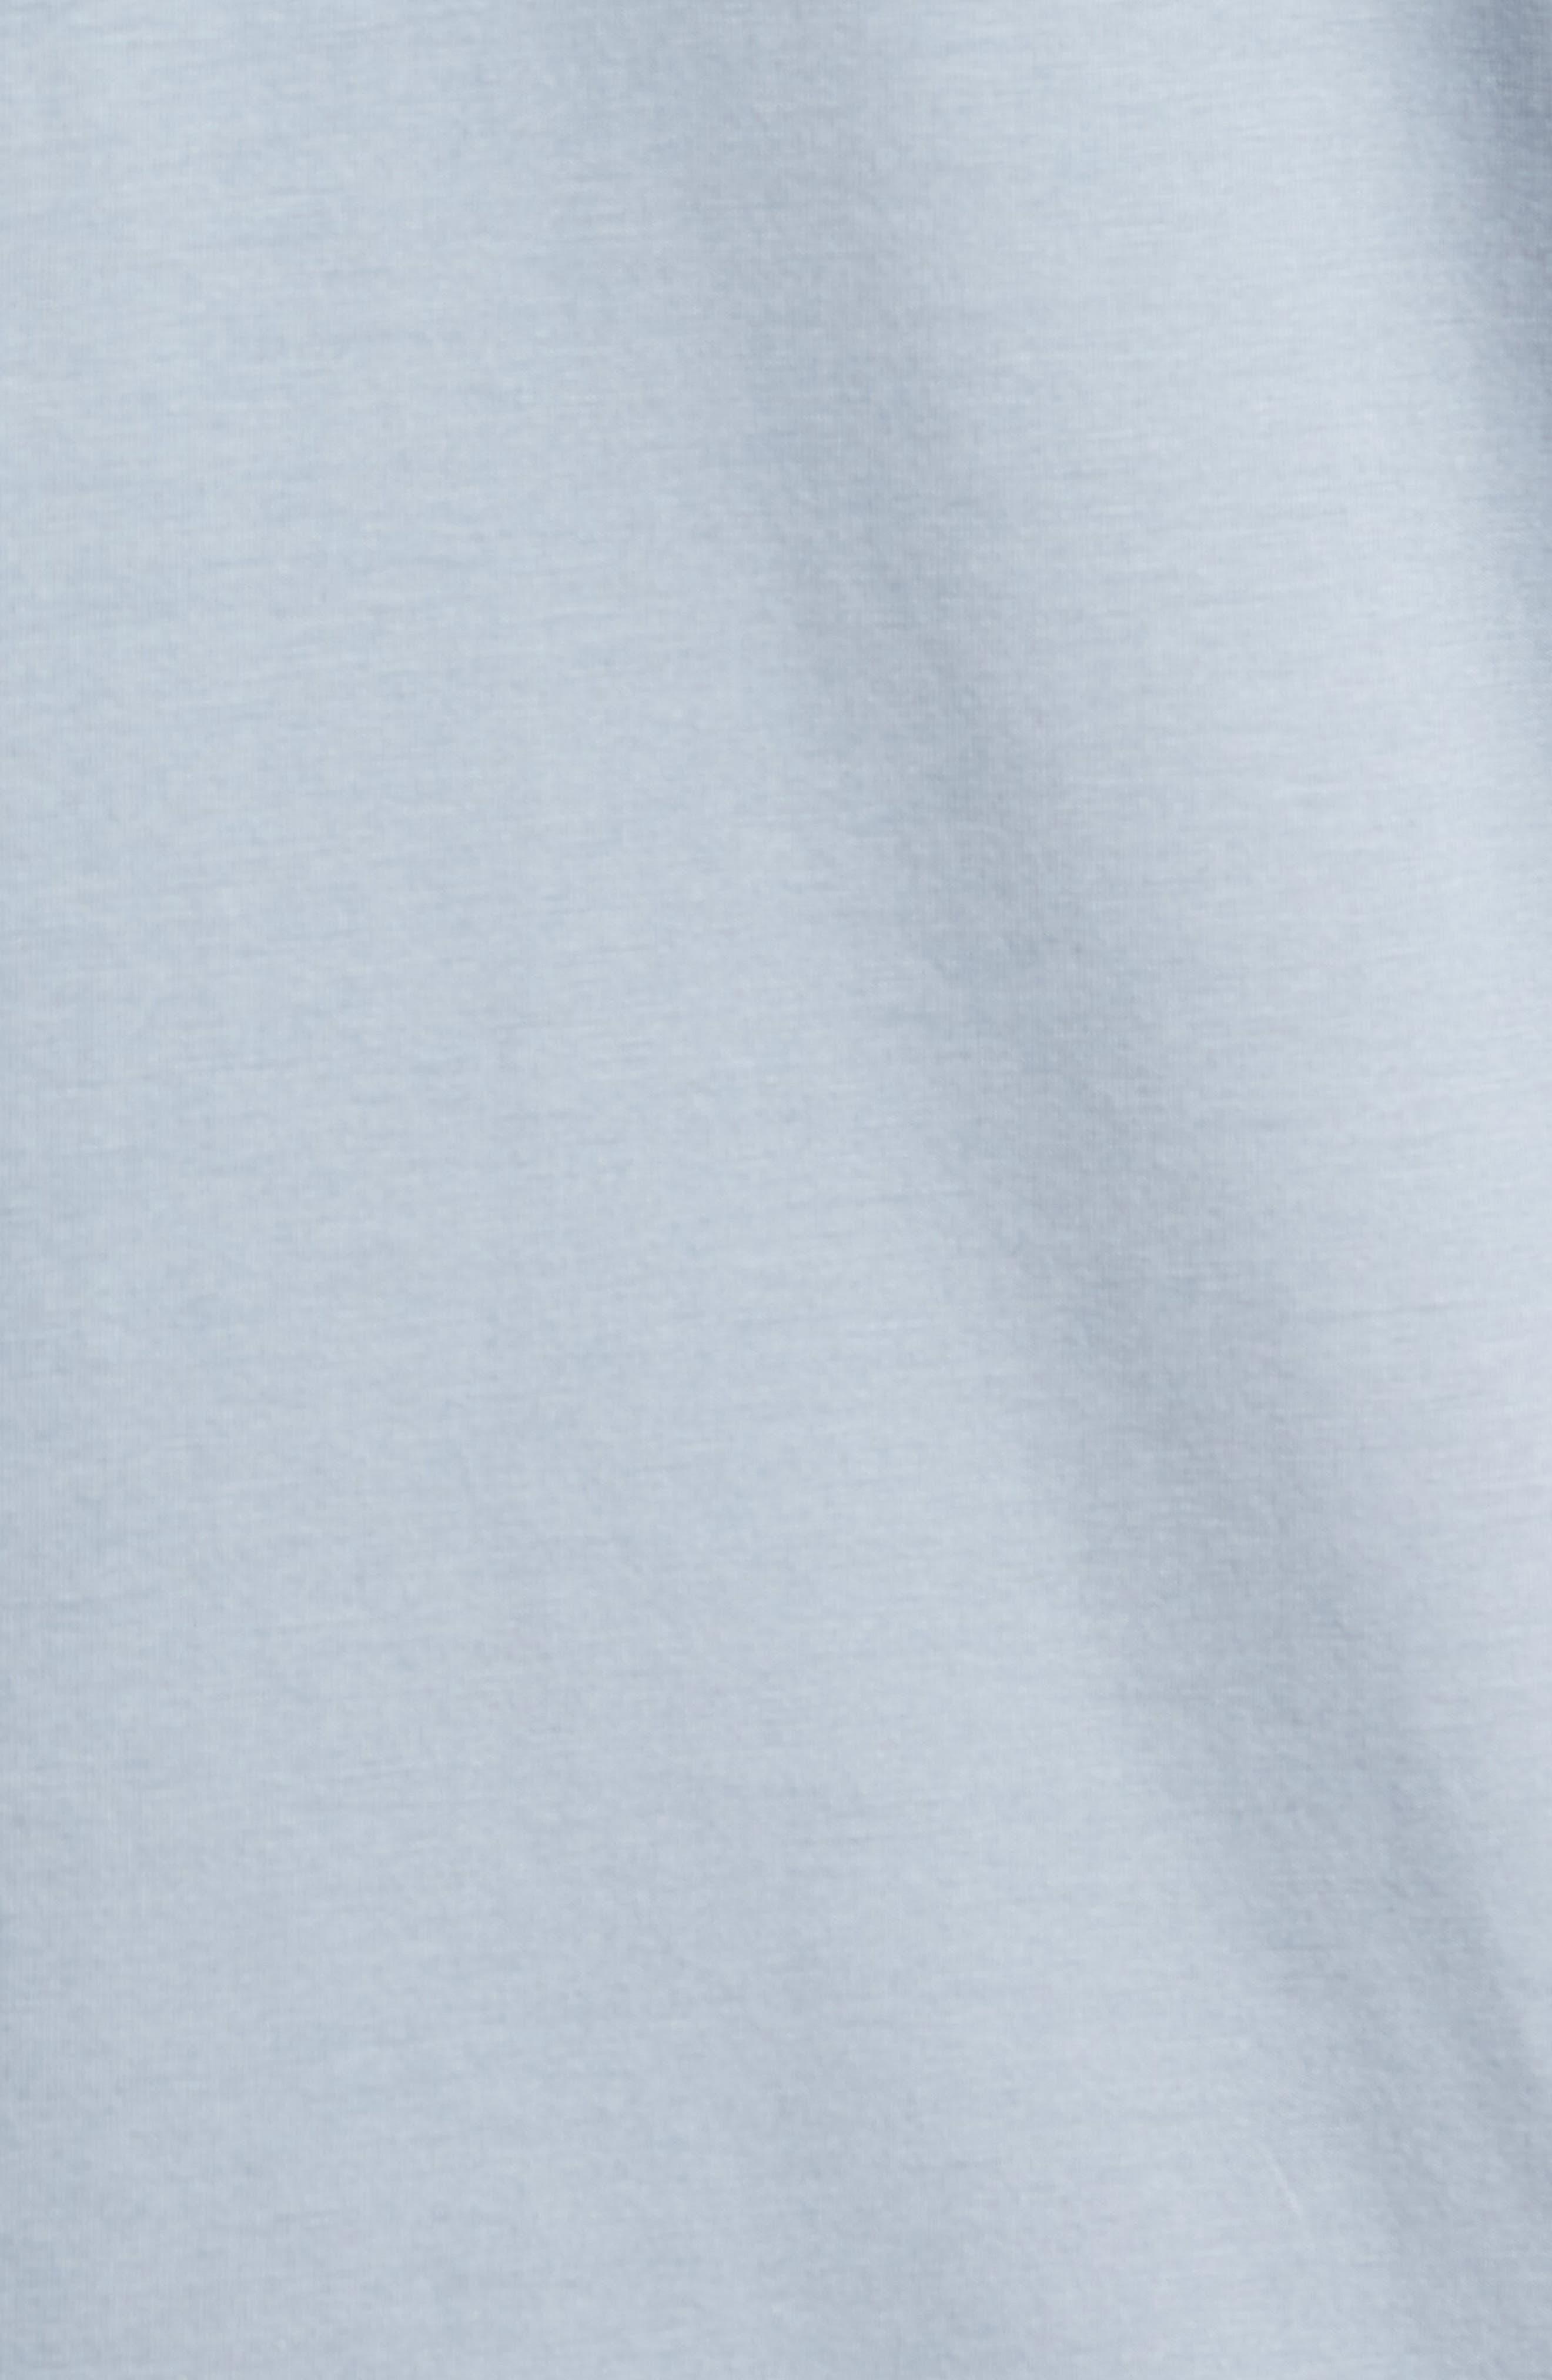 Tropicool T-Shirt,                             Alternate thumbnail 5, color,                             050